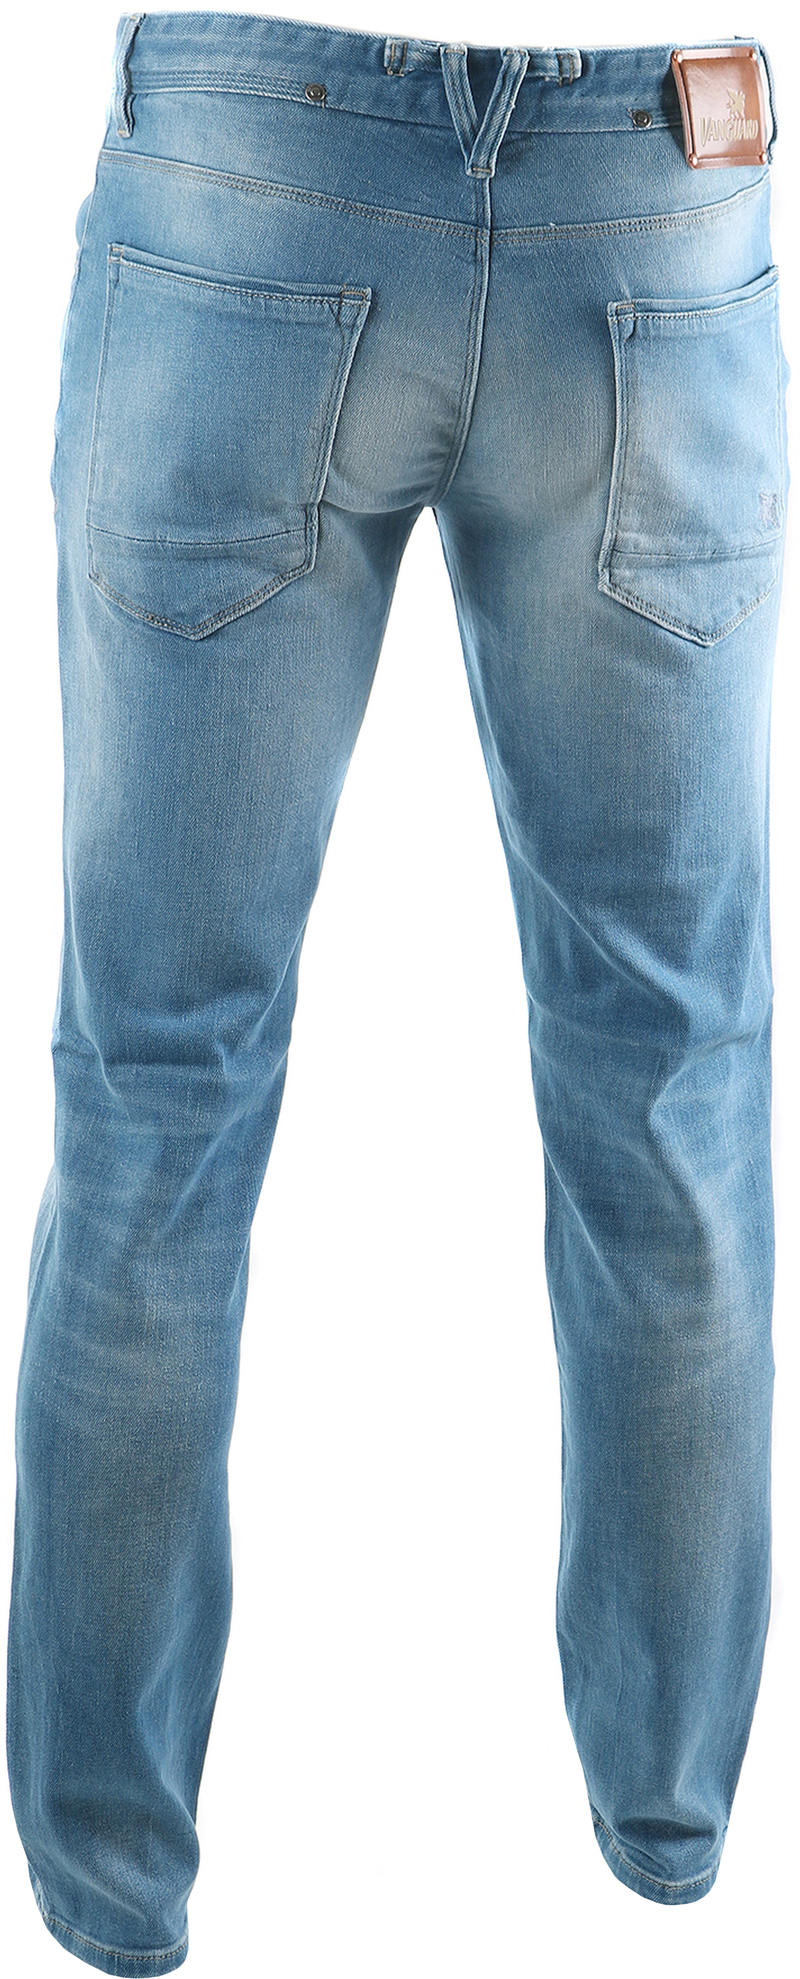 Vanguard V7 Rider Jeans Clear Blue foto 4